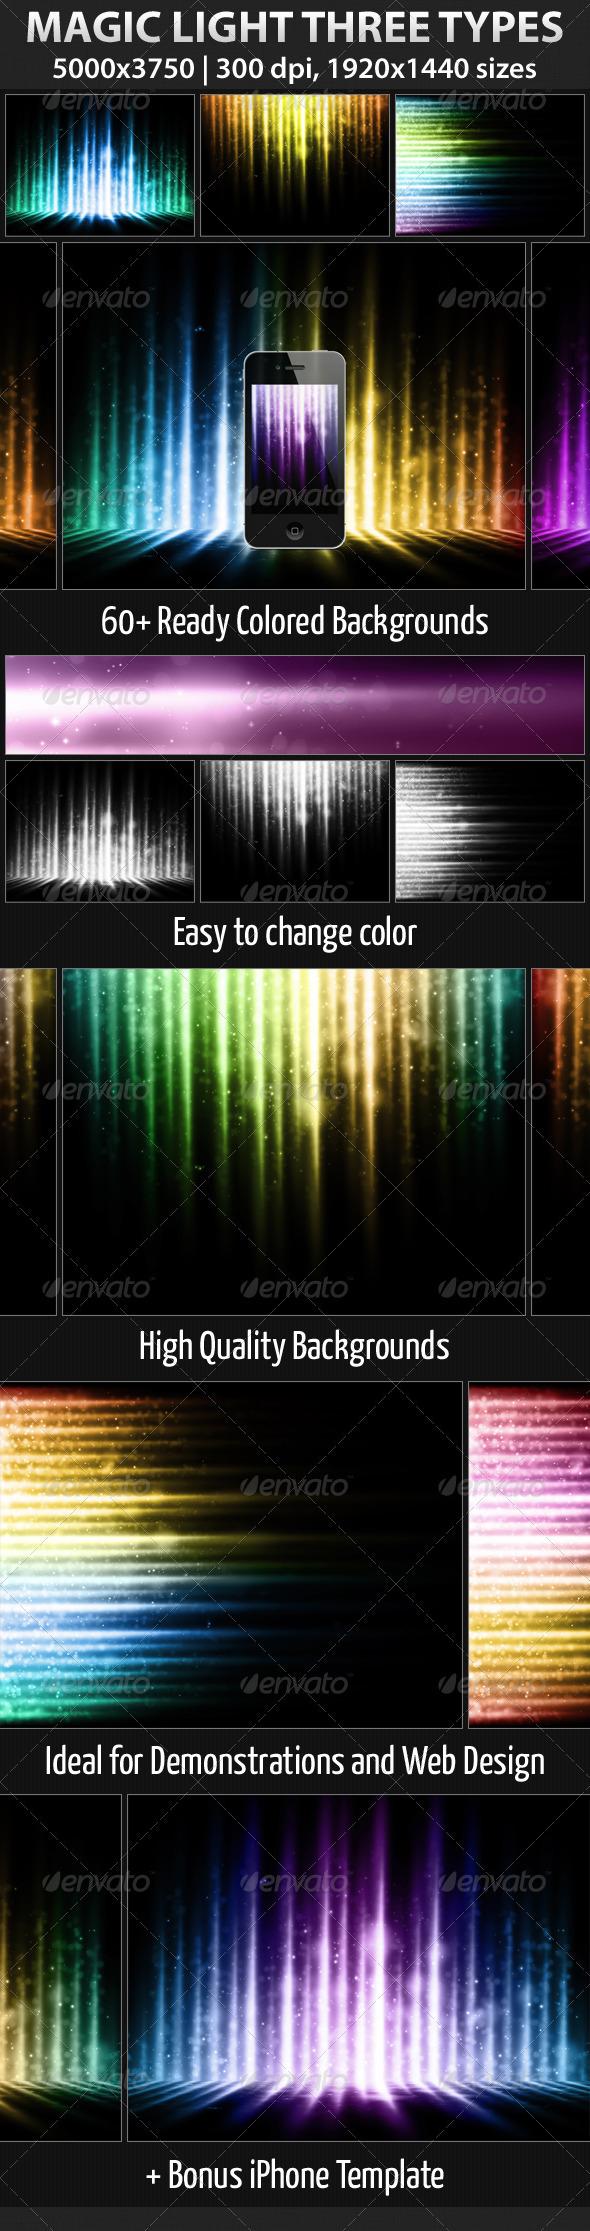 GraphicRiver Magic Light Three Types 1688710